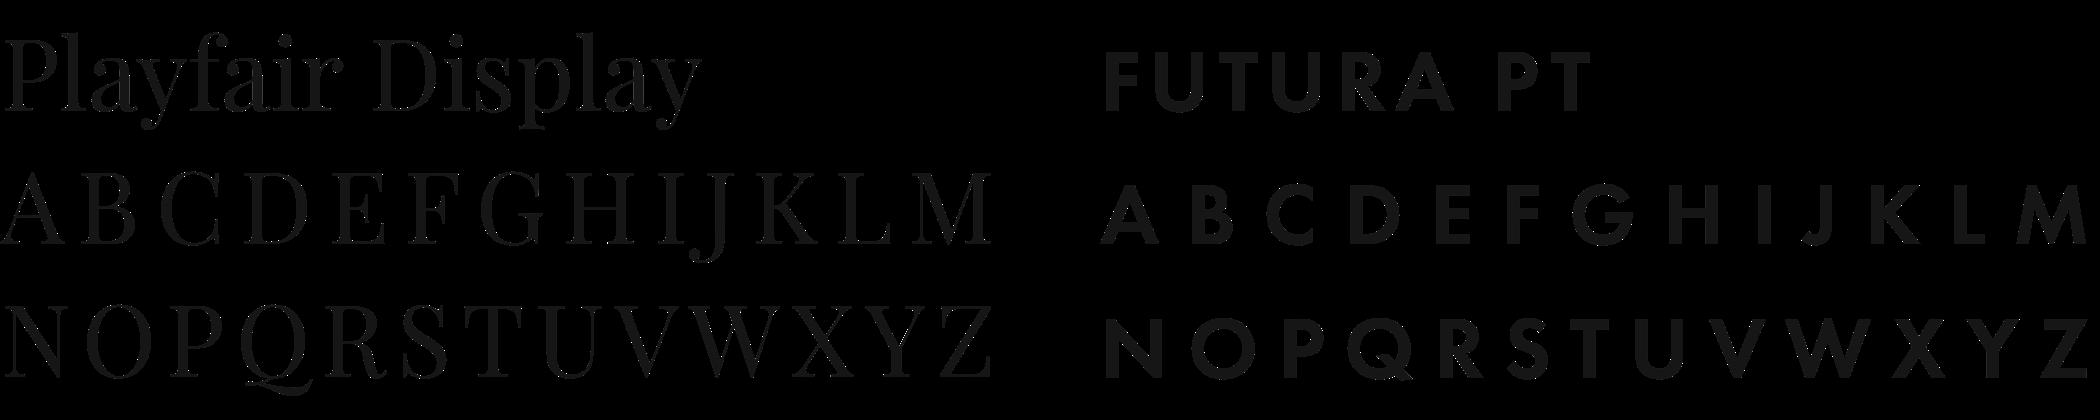 font system 3.png